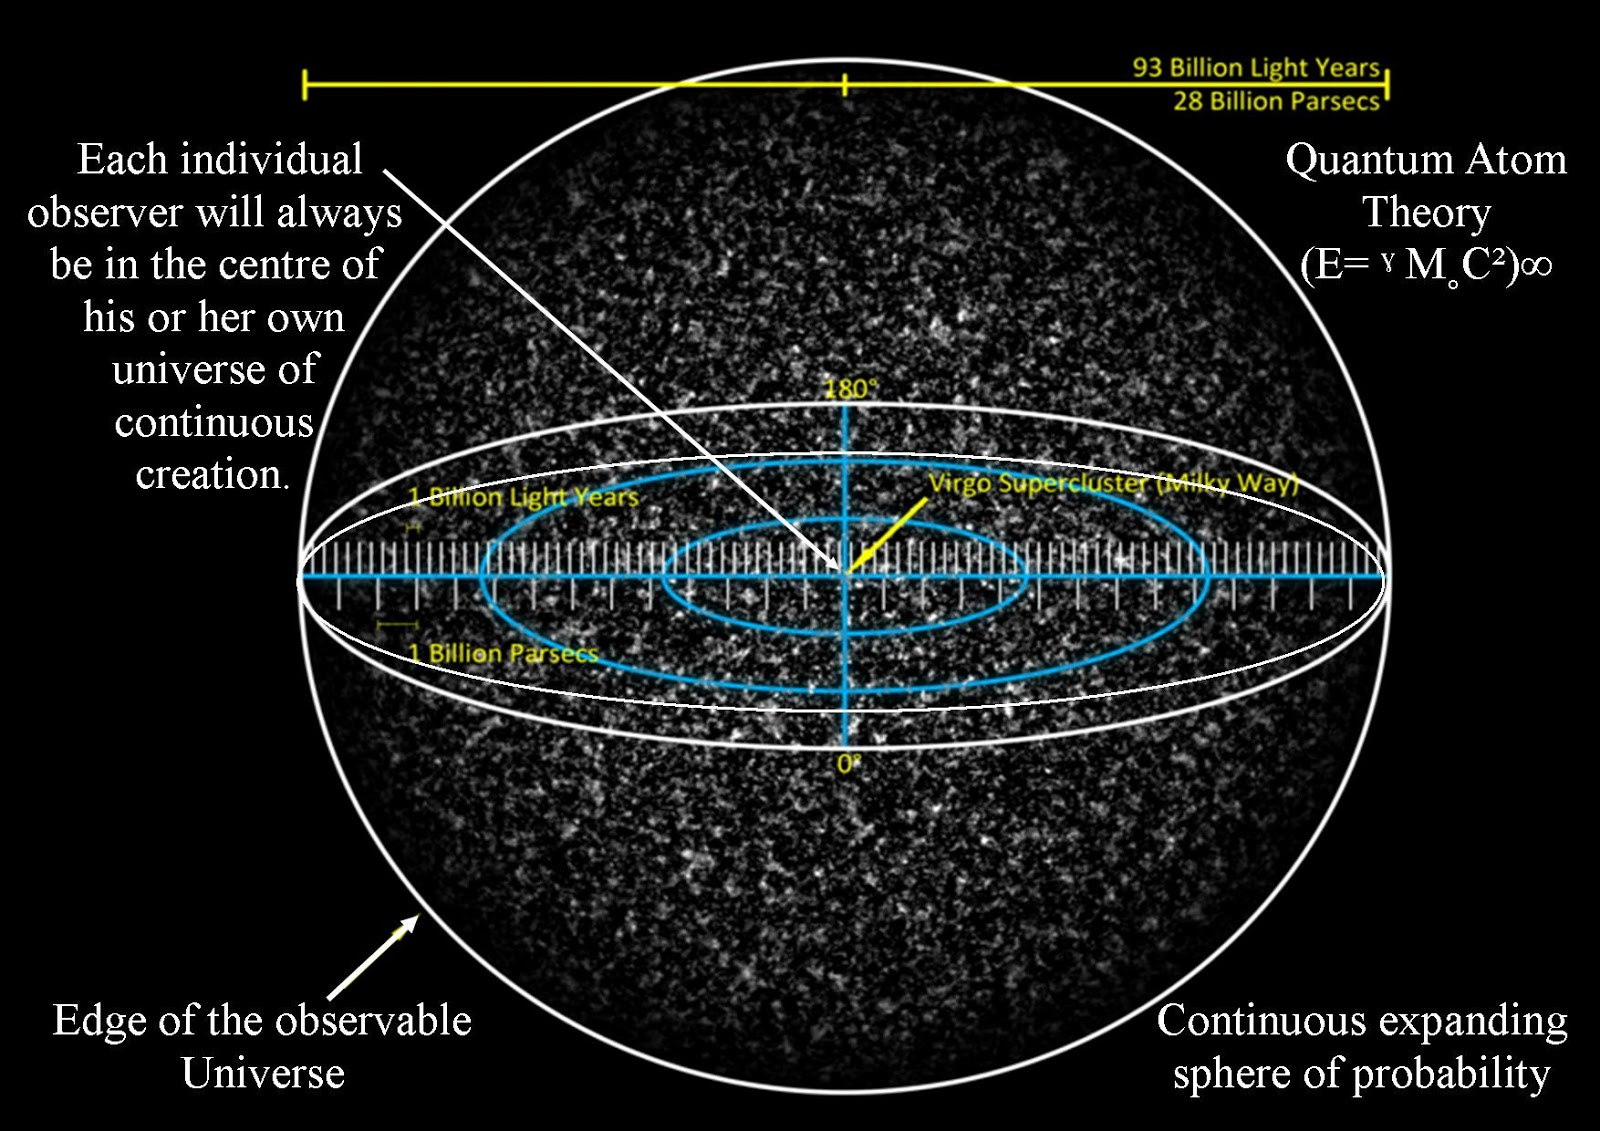 http://3.bp.blogspot.com/-6S6ruRlVabo/USIYxoUo_0I/AAAAAAAAFJA/4N7bN4jBEEc/s1600/Supper+clusters+of+galaxies+3.jpg